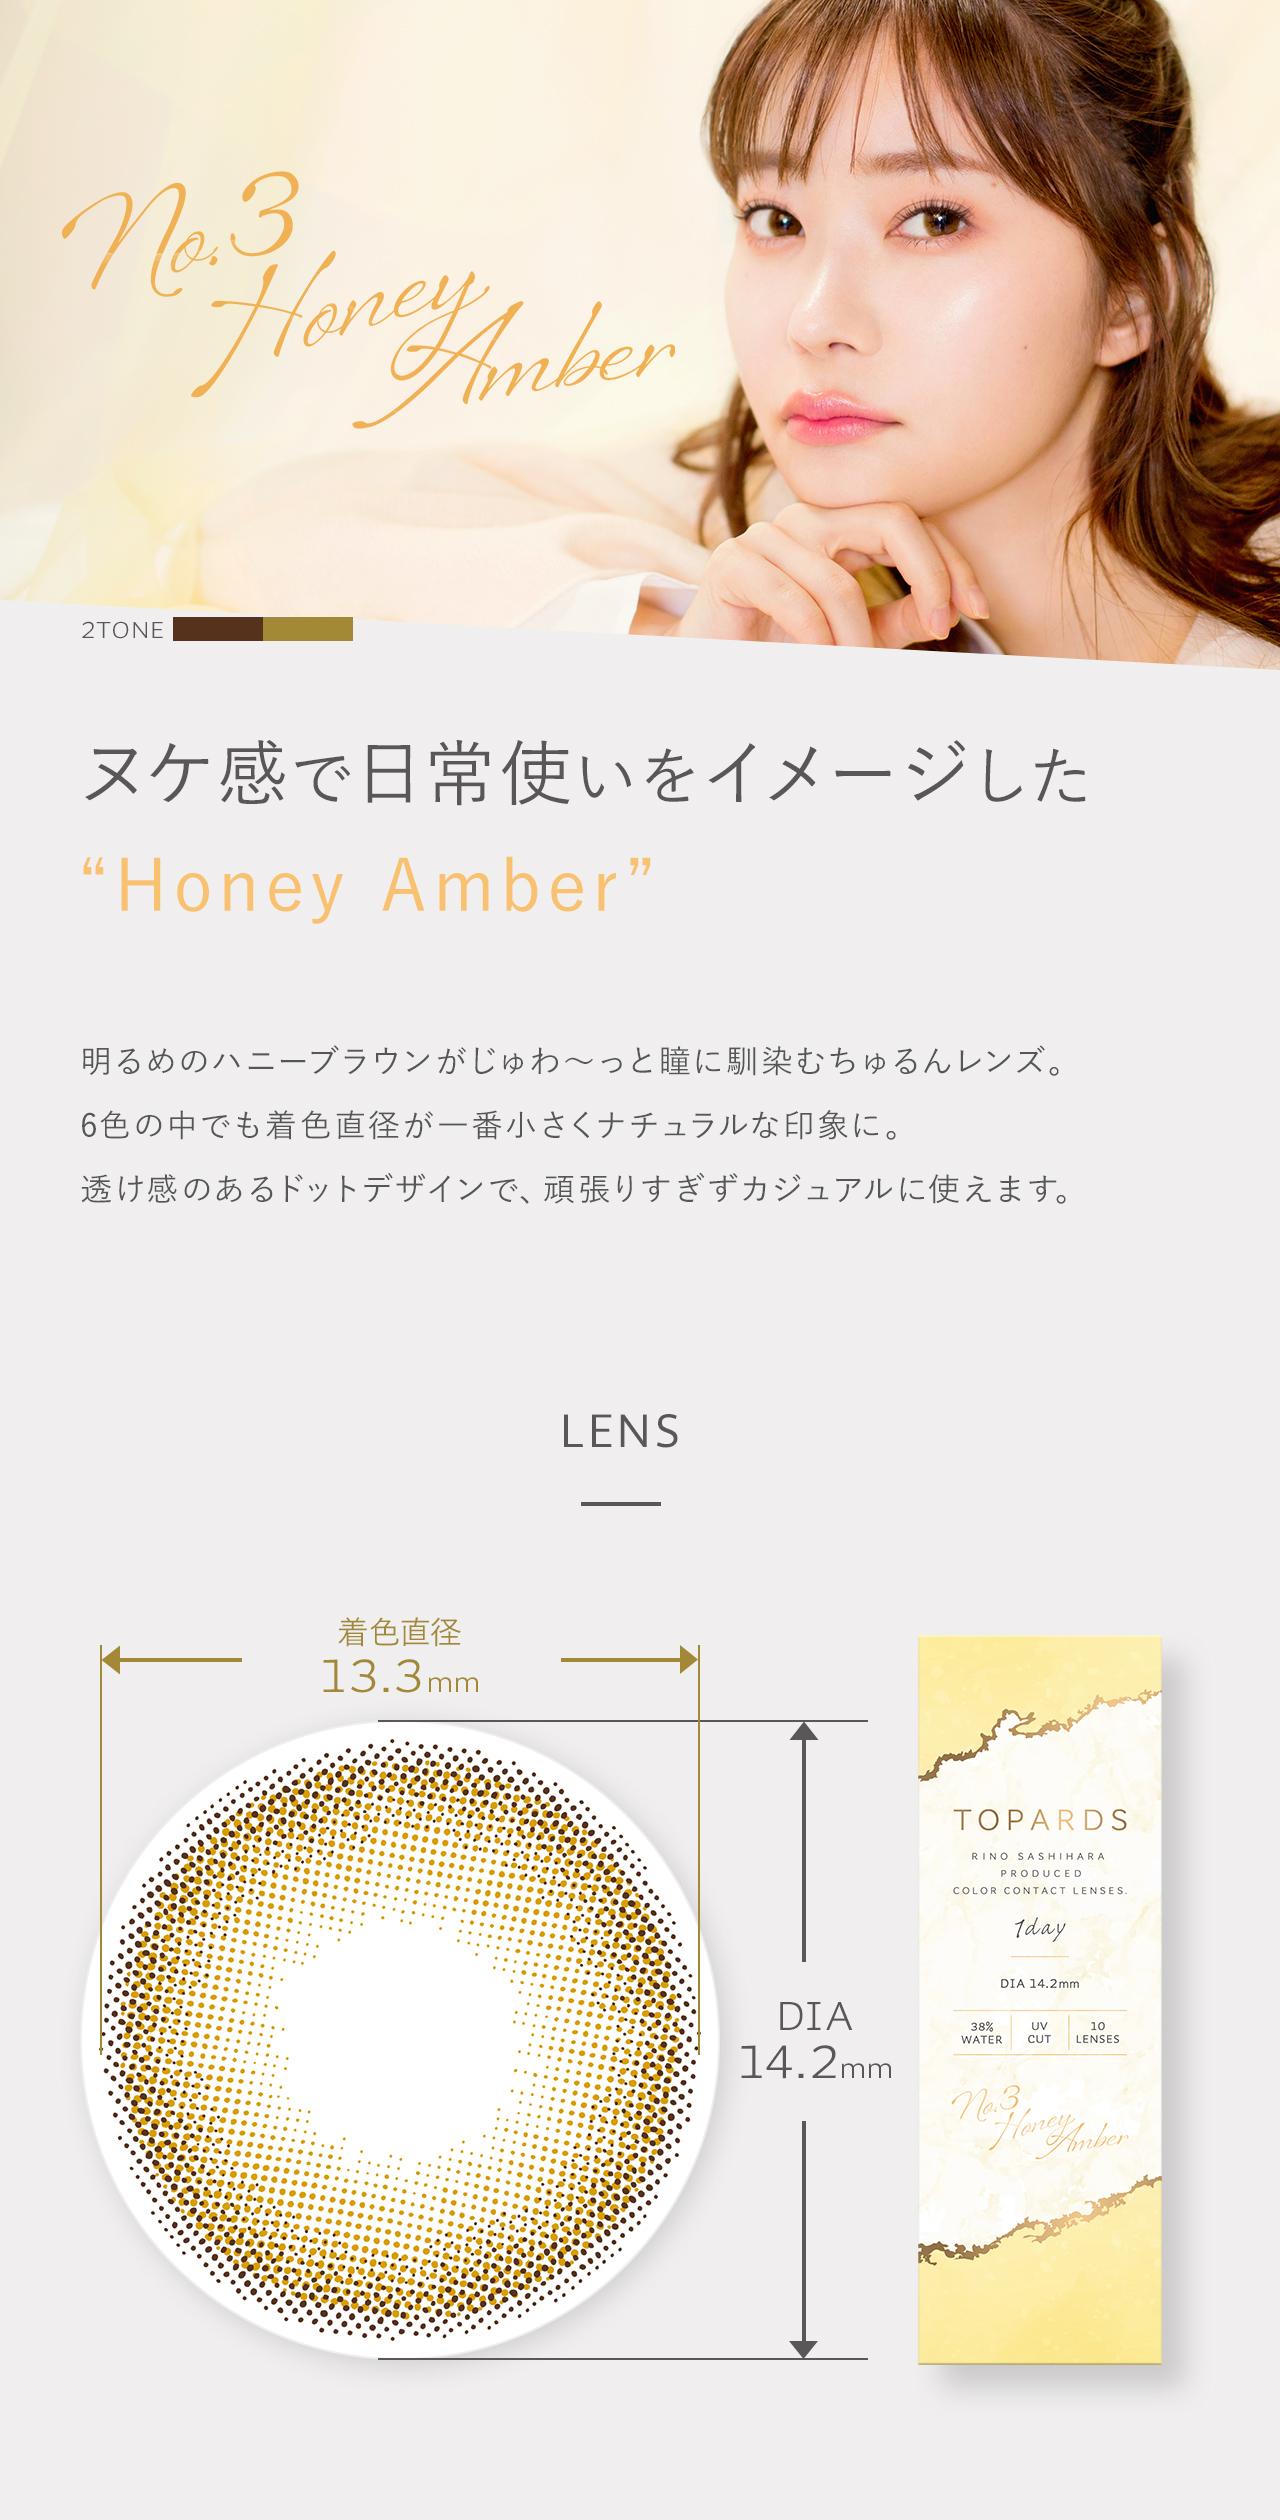 Honey Amber ハニーアンバー